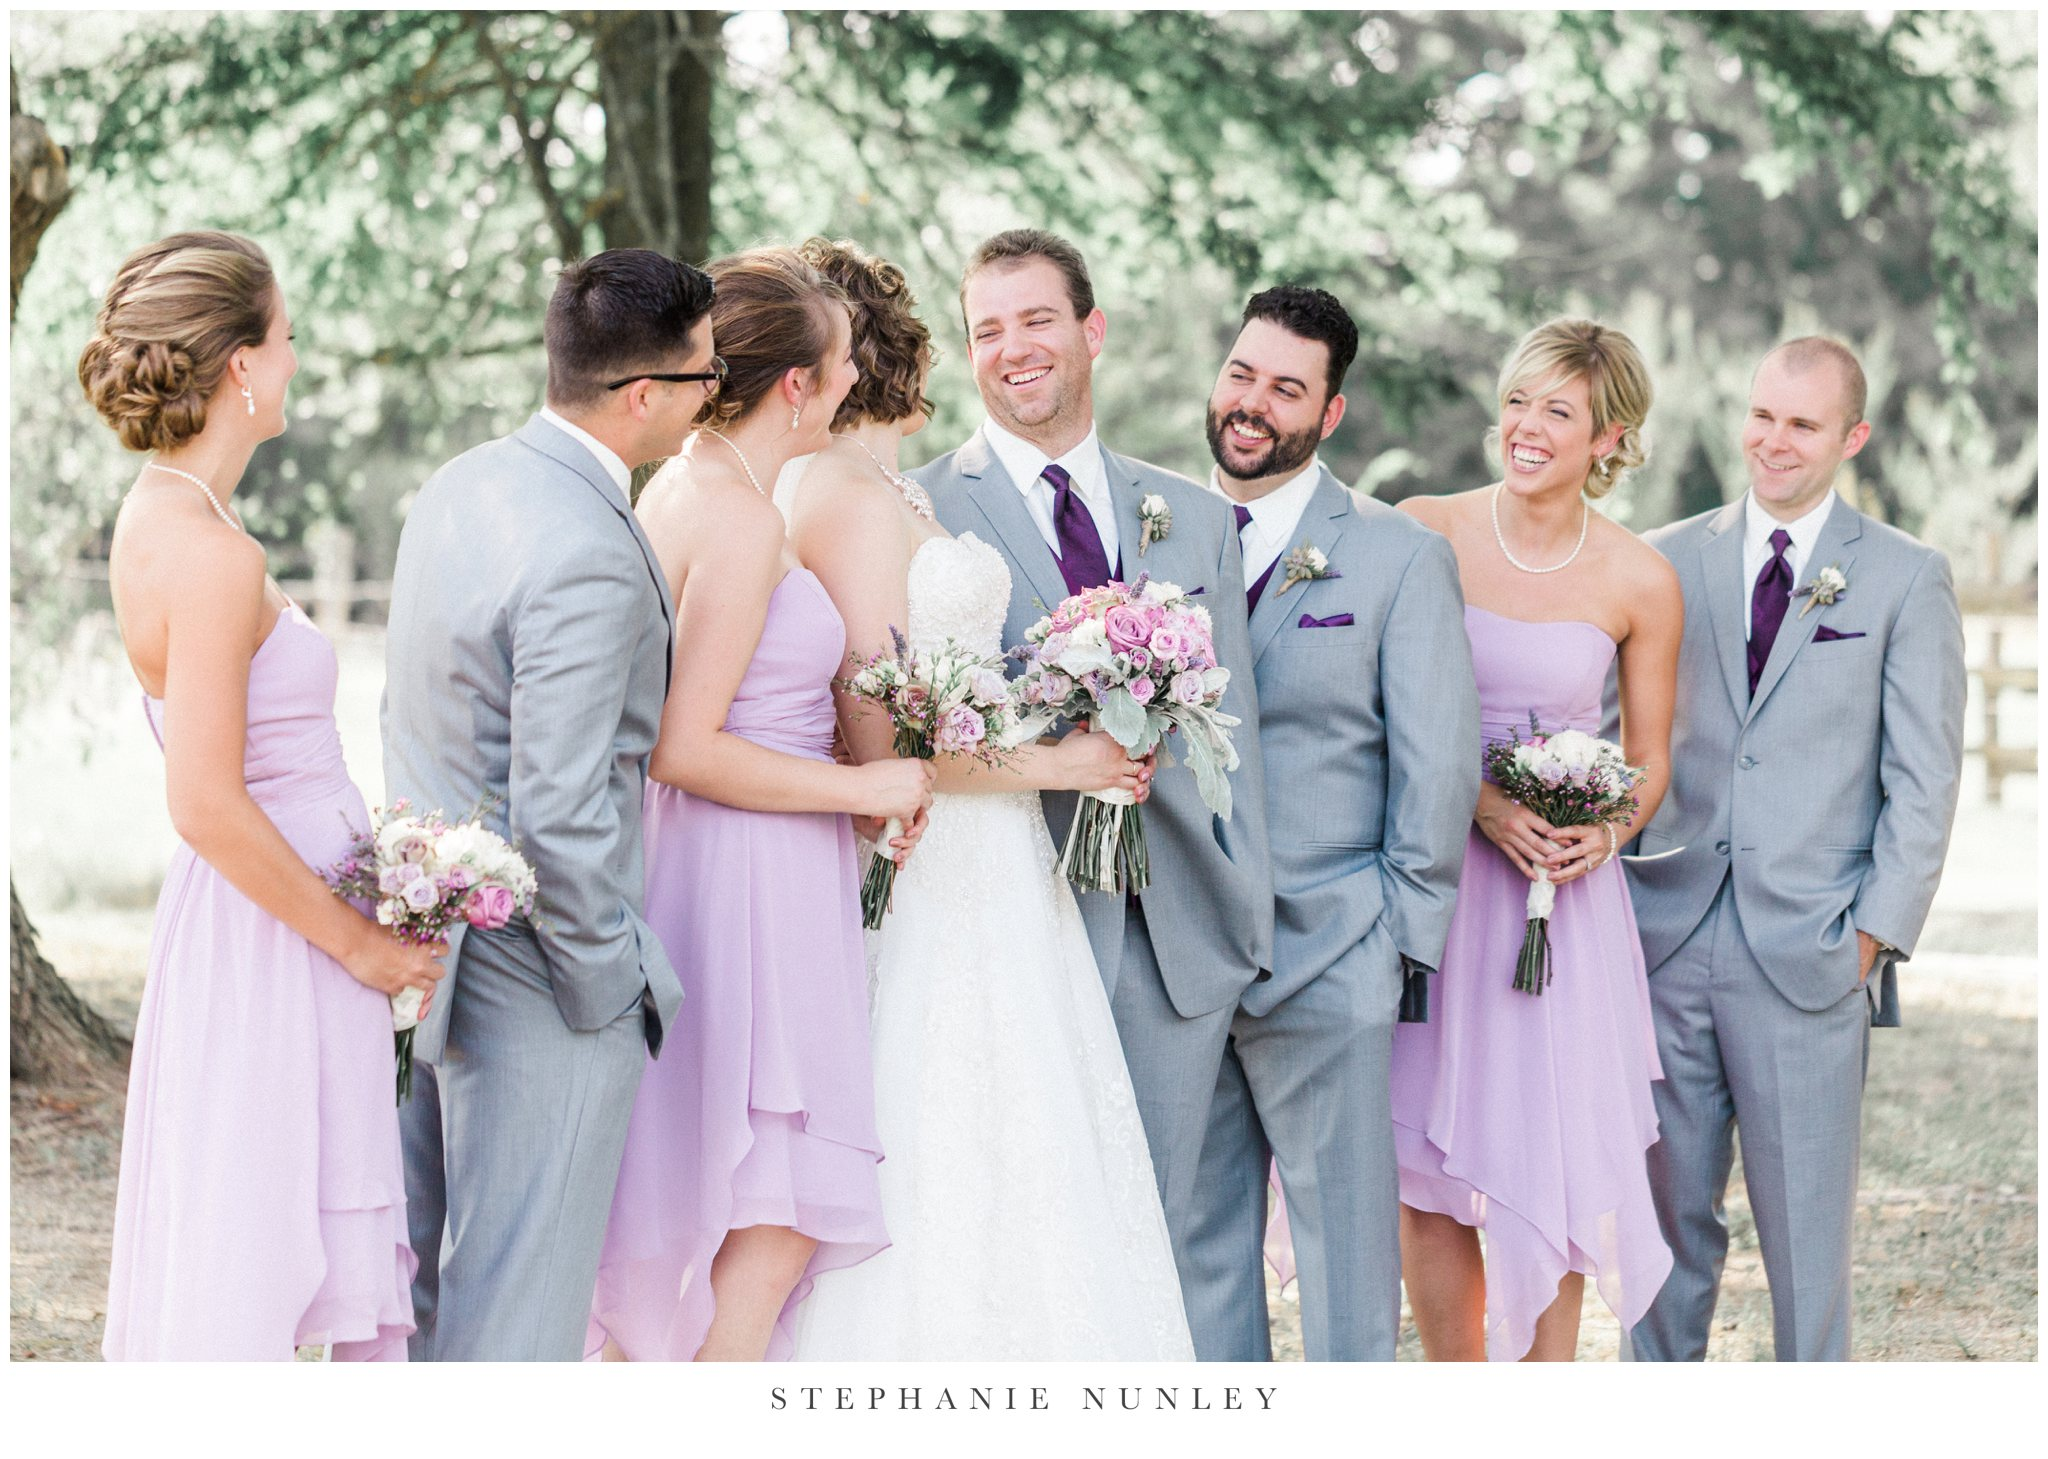 southern-classy-outdoor-barn-wedding-photos-0058.jpg